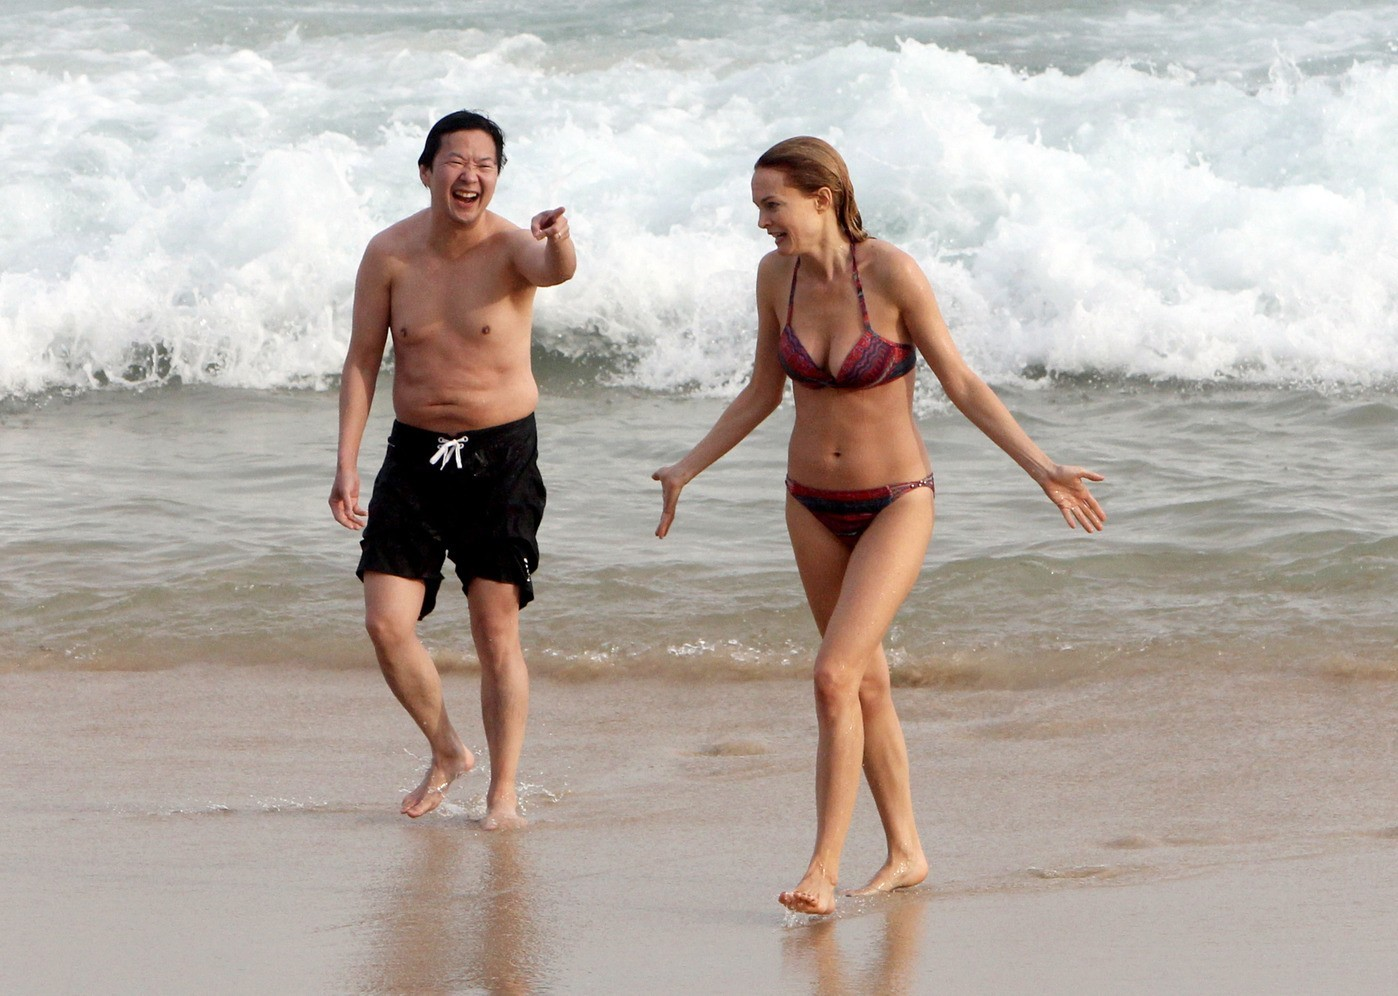 bradley cooper shirtless beach brazil rio hangover heather graham ken jeong